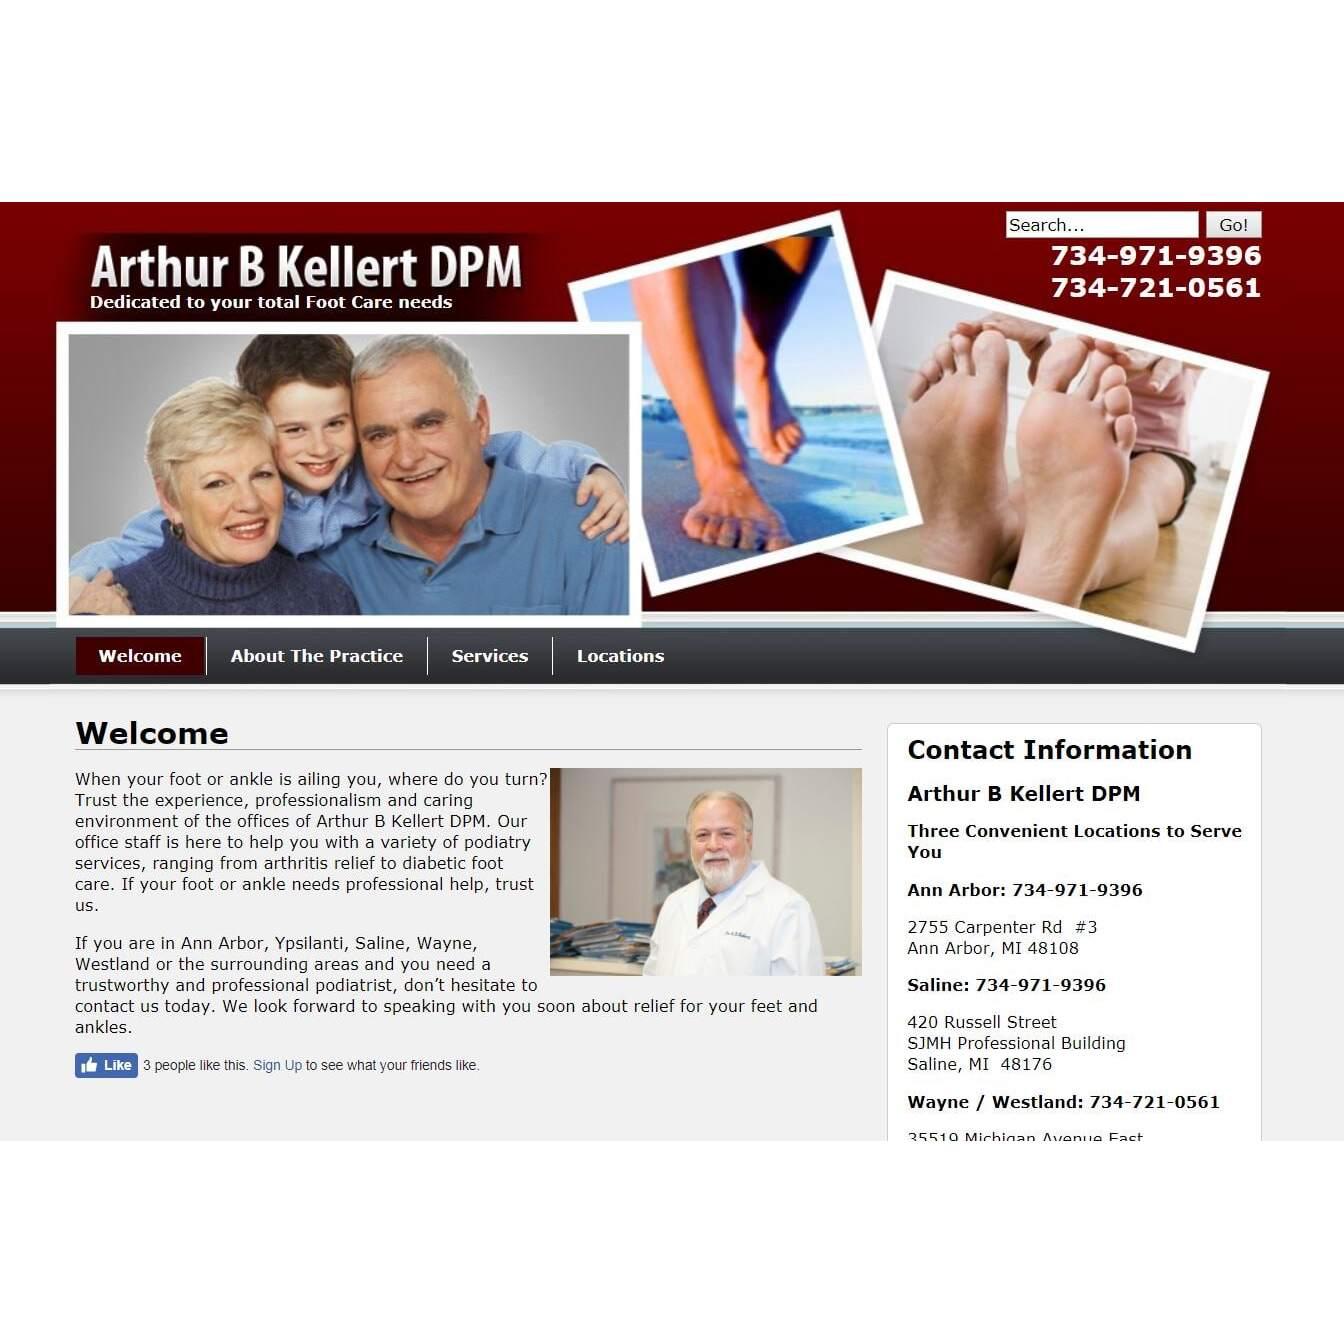 Arthur Kellert DPM